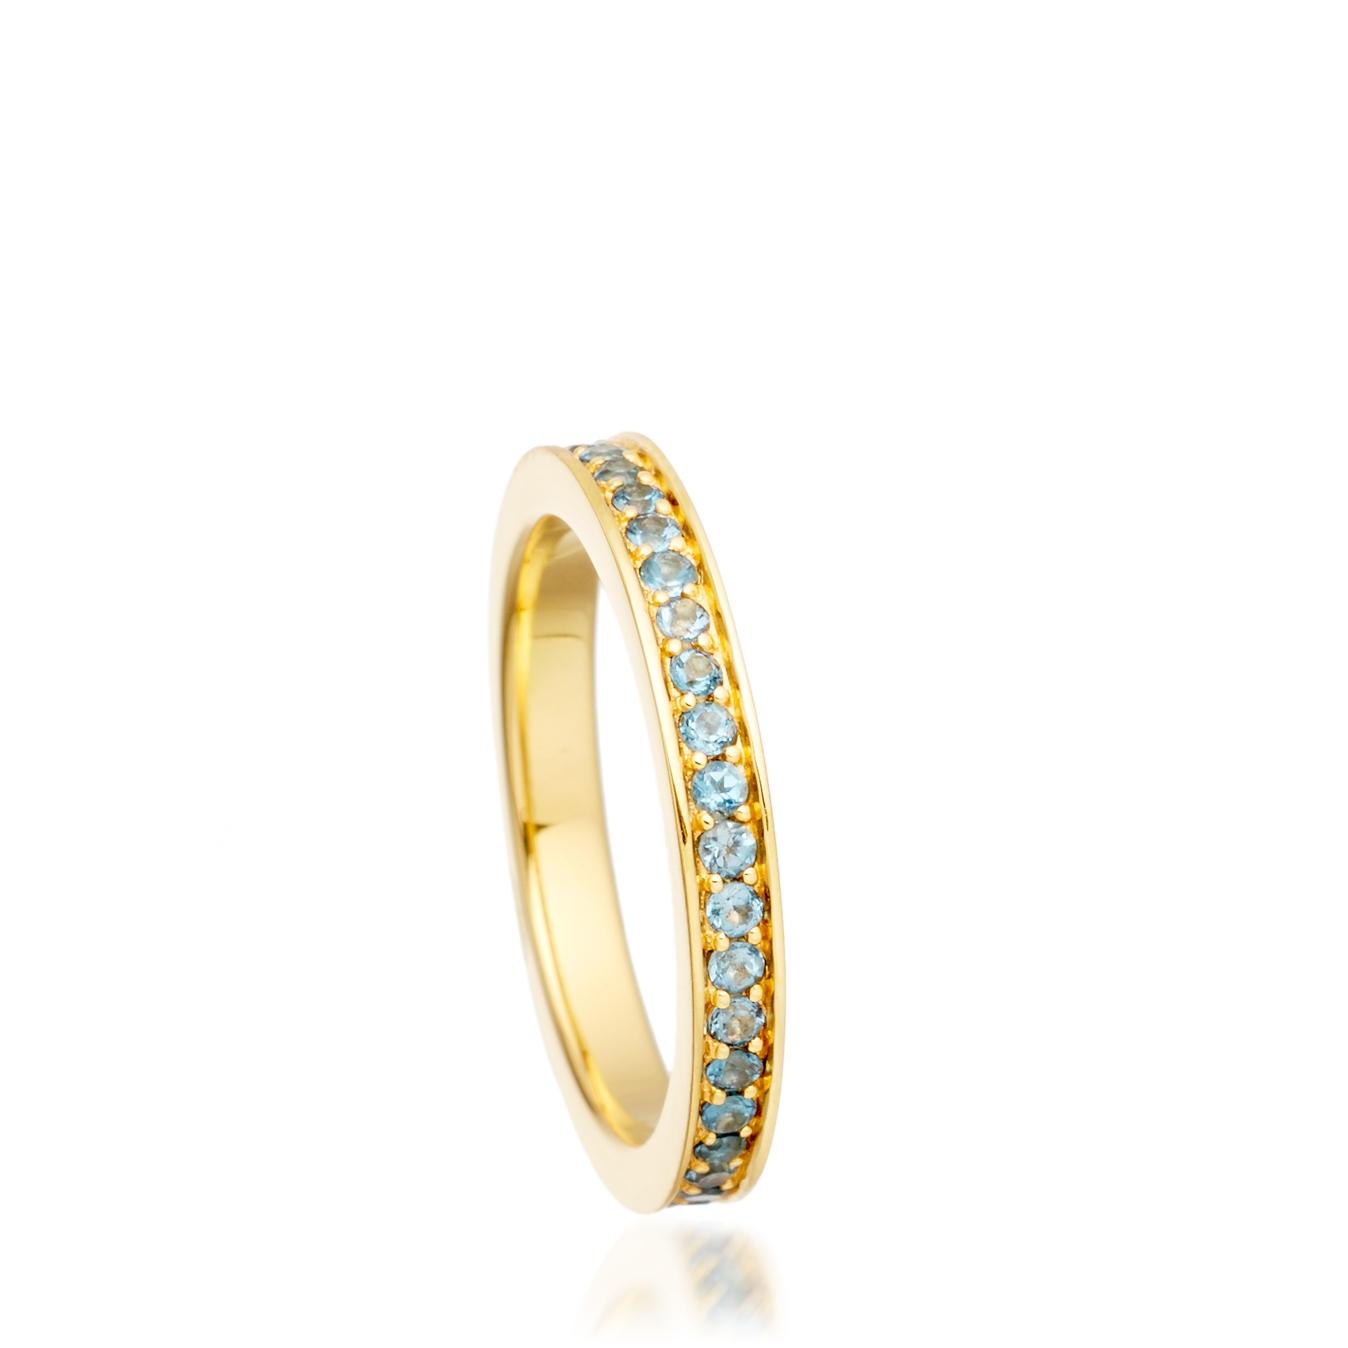 London Blue Topaz Infinity Ring